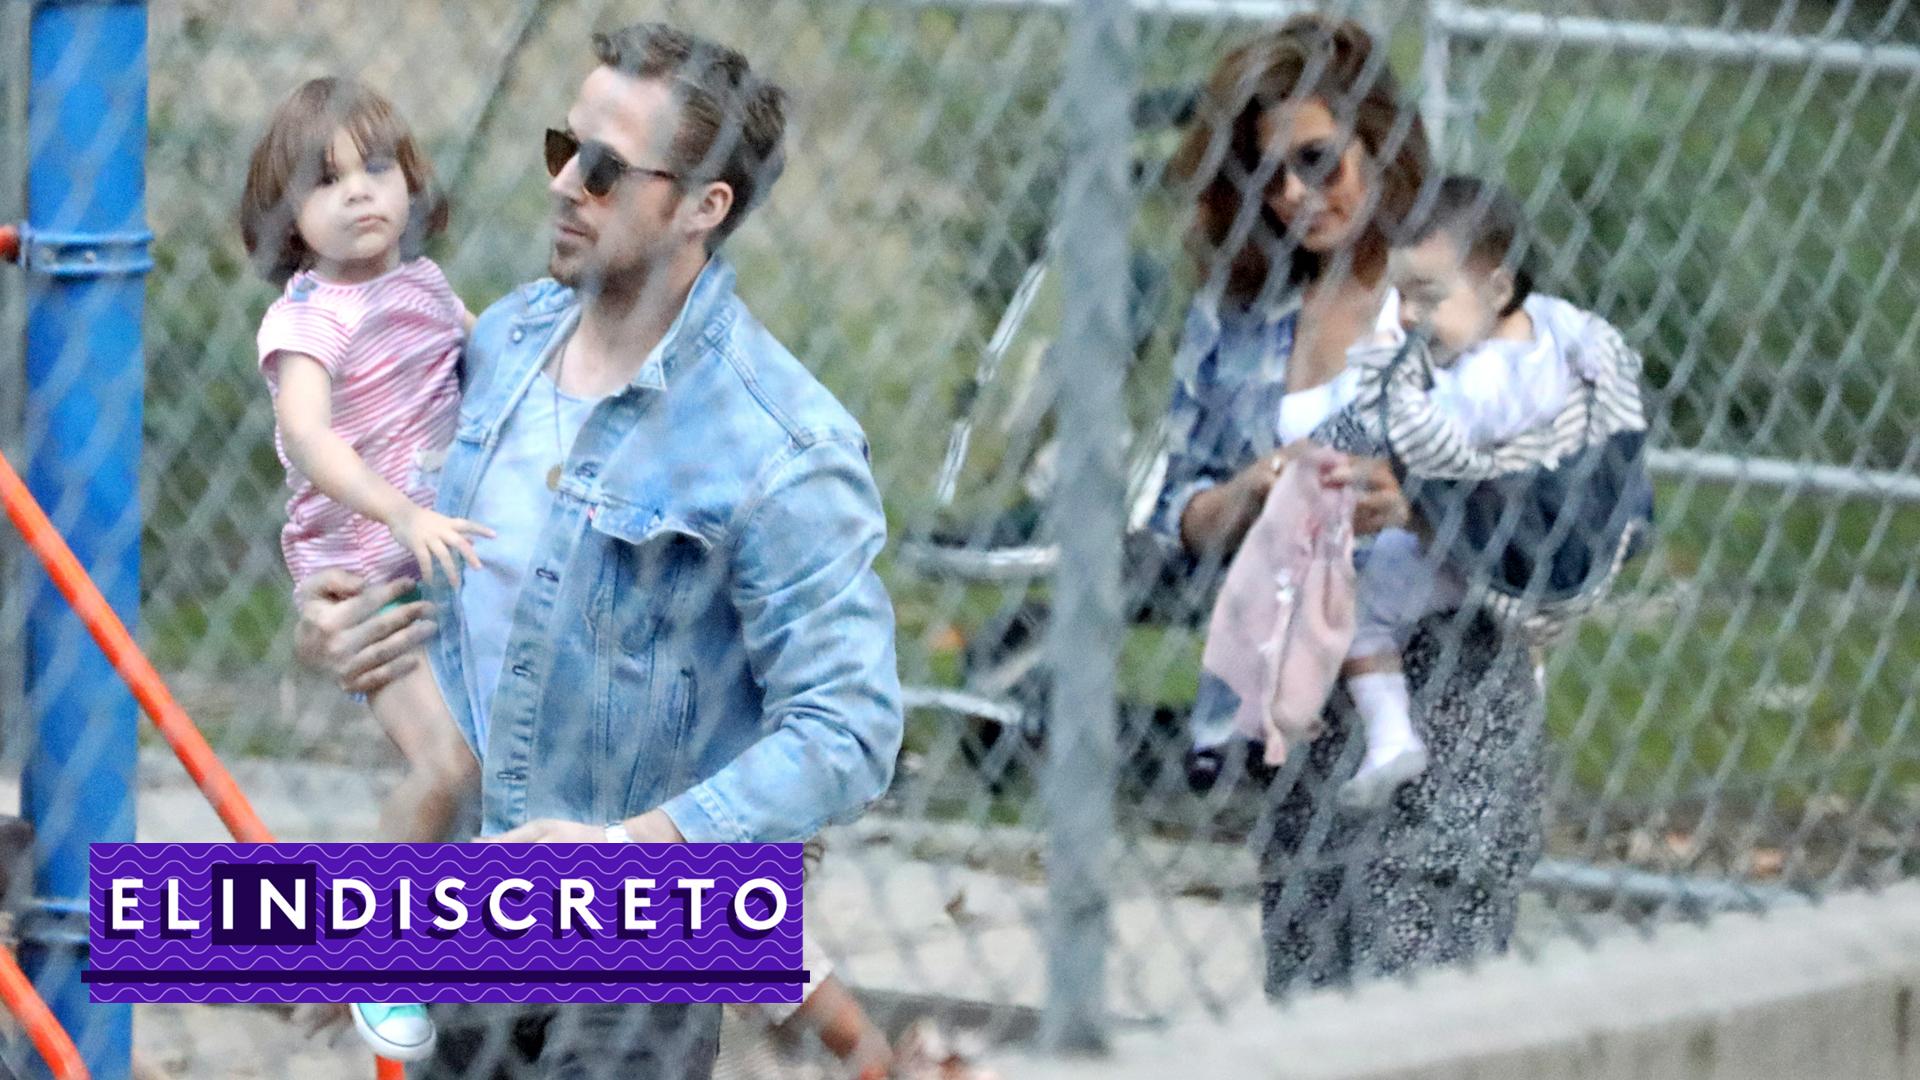 Eva mendes and ryan gosling 2015 dating 6